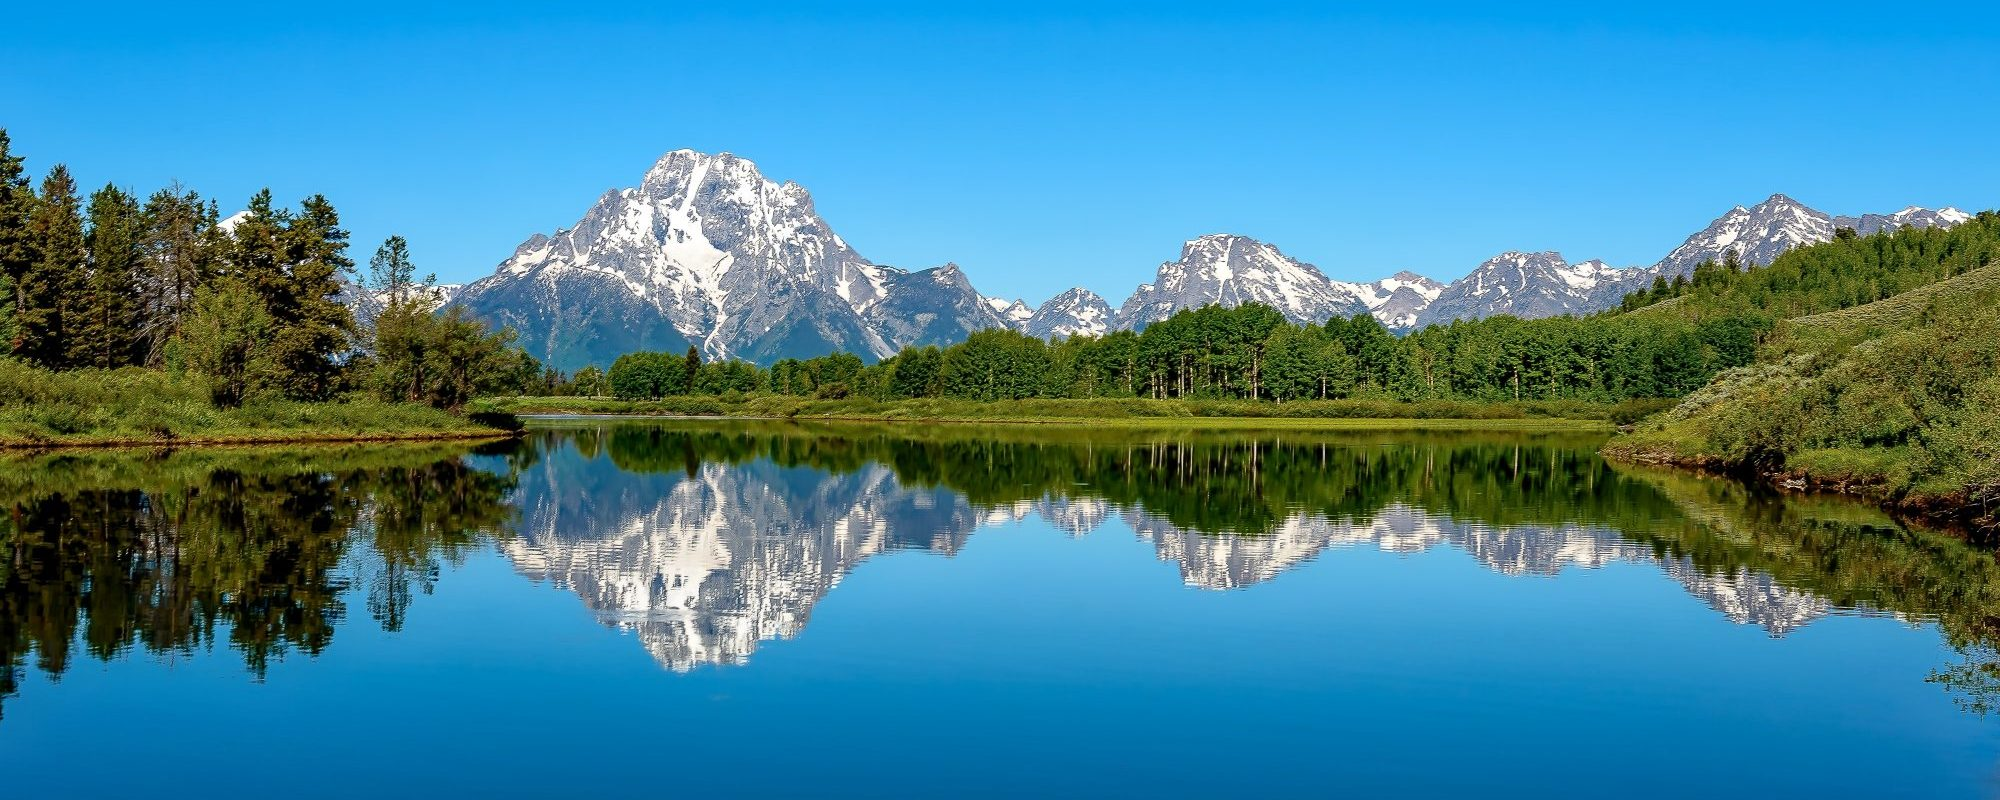 moutains-lake-reflection-e1580242537227